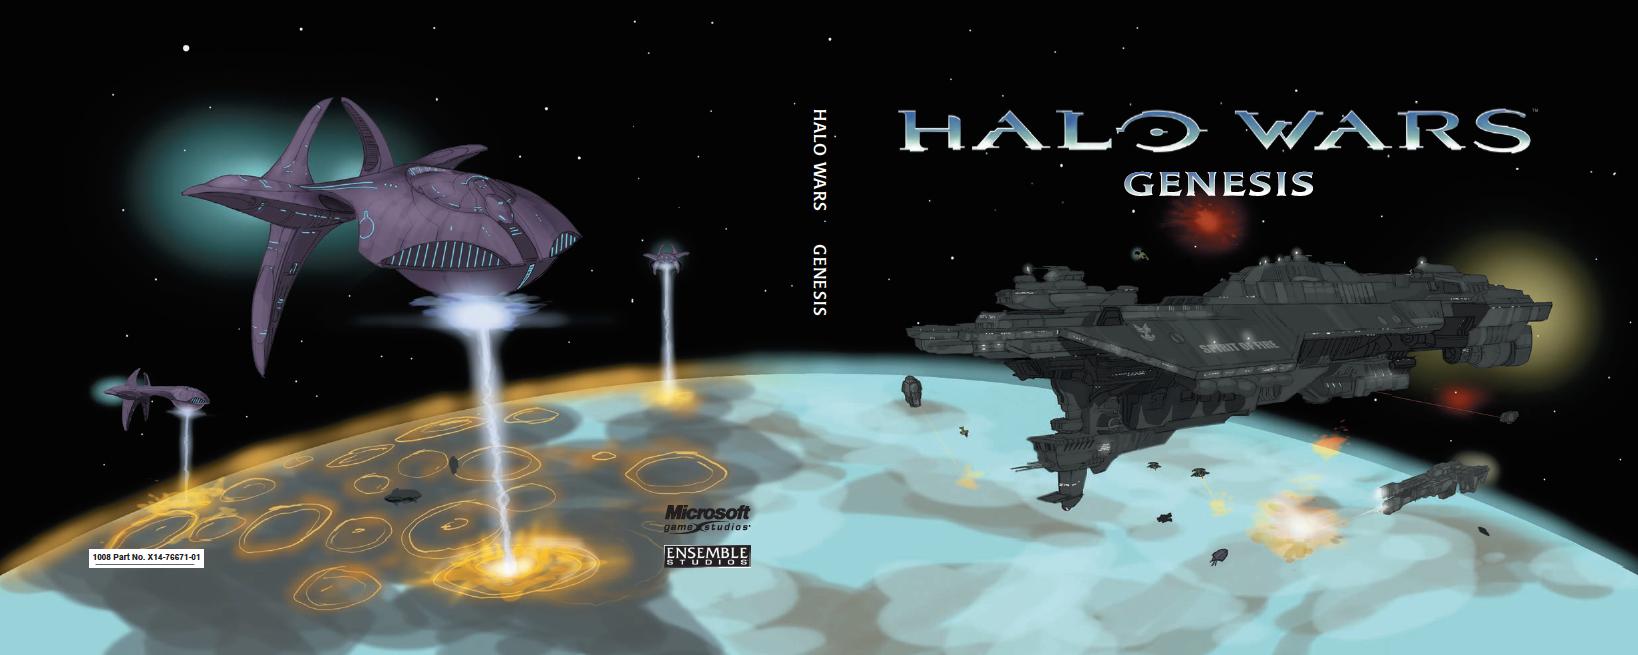 Halo Wars: Génesis